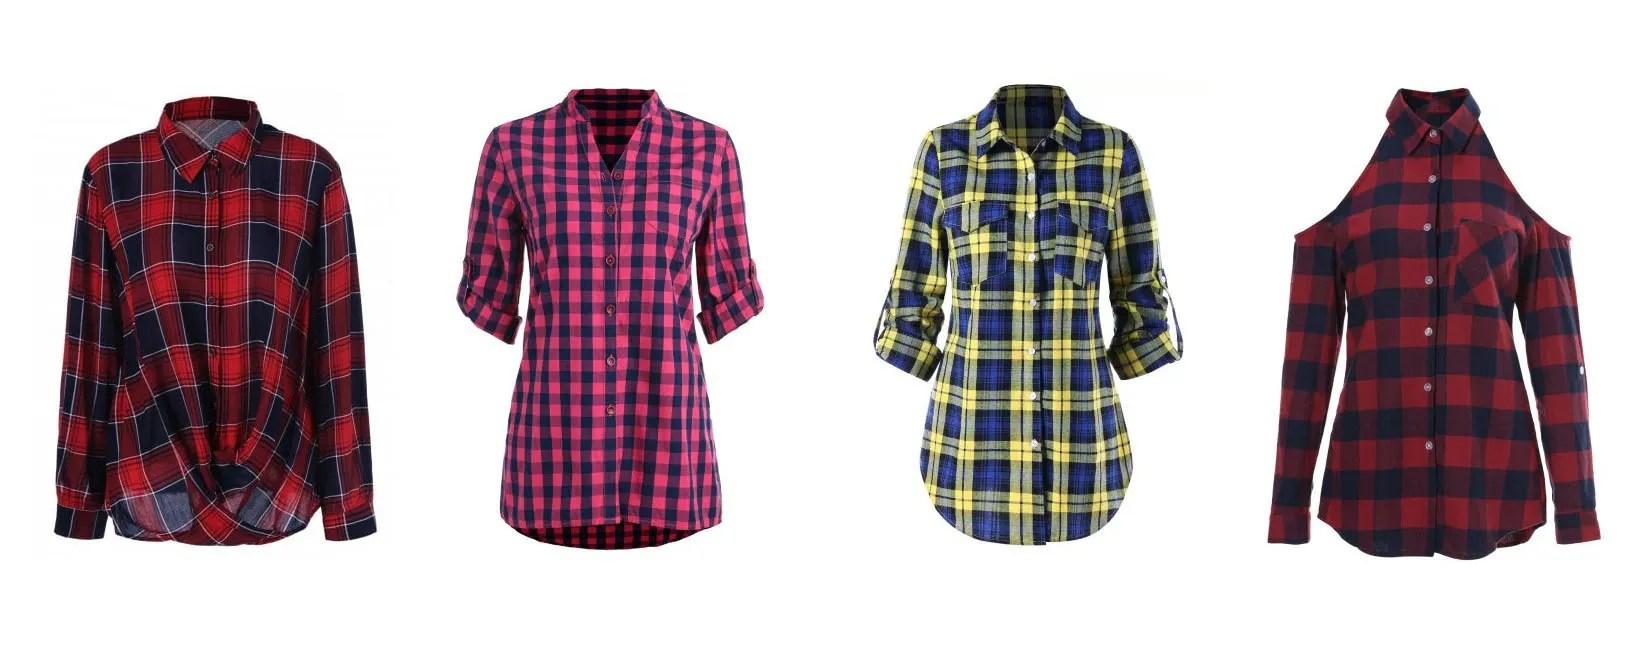 Camisa xadrez na Festa Junina - Rosegal